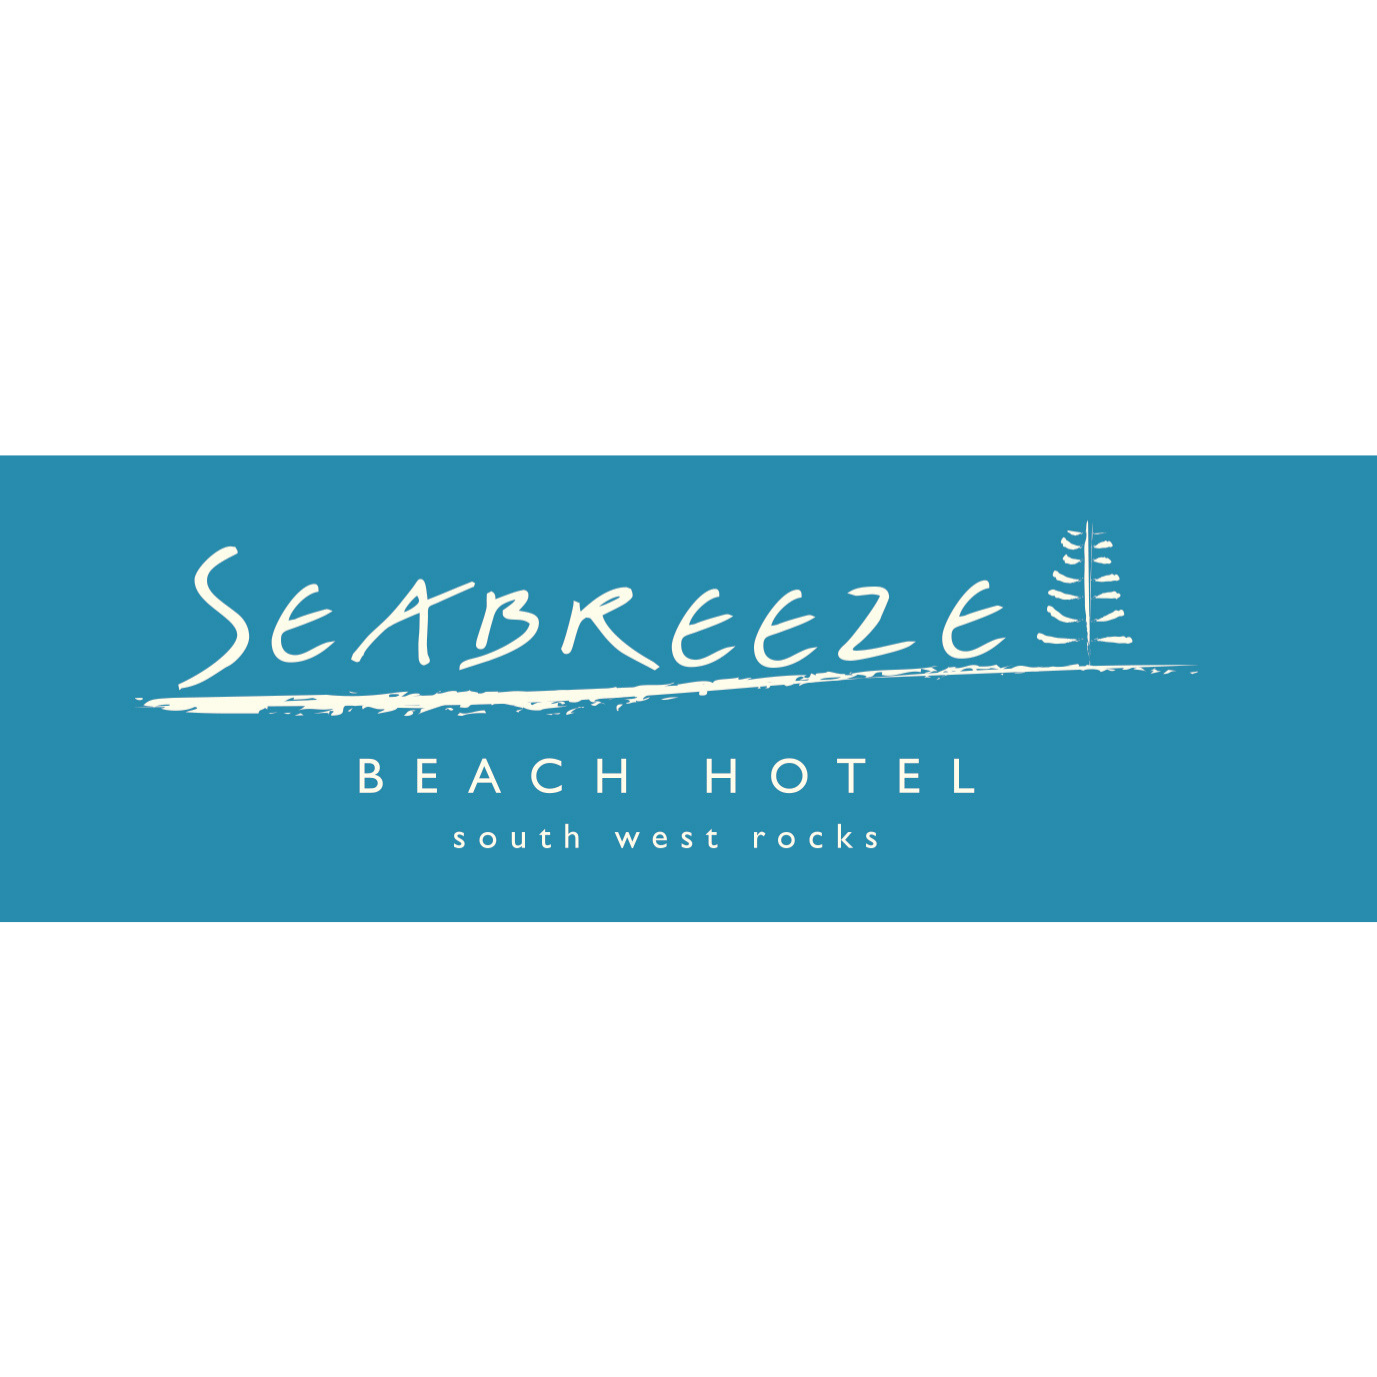 Seabreeze_logo_1377sq.png